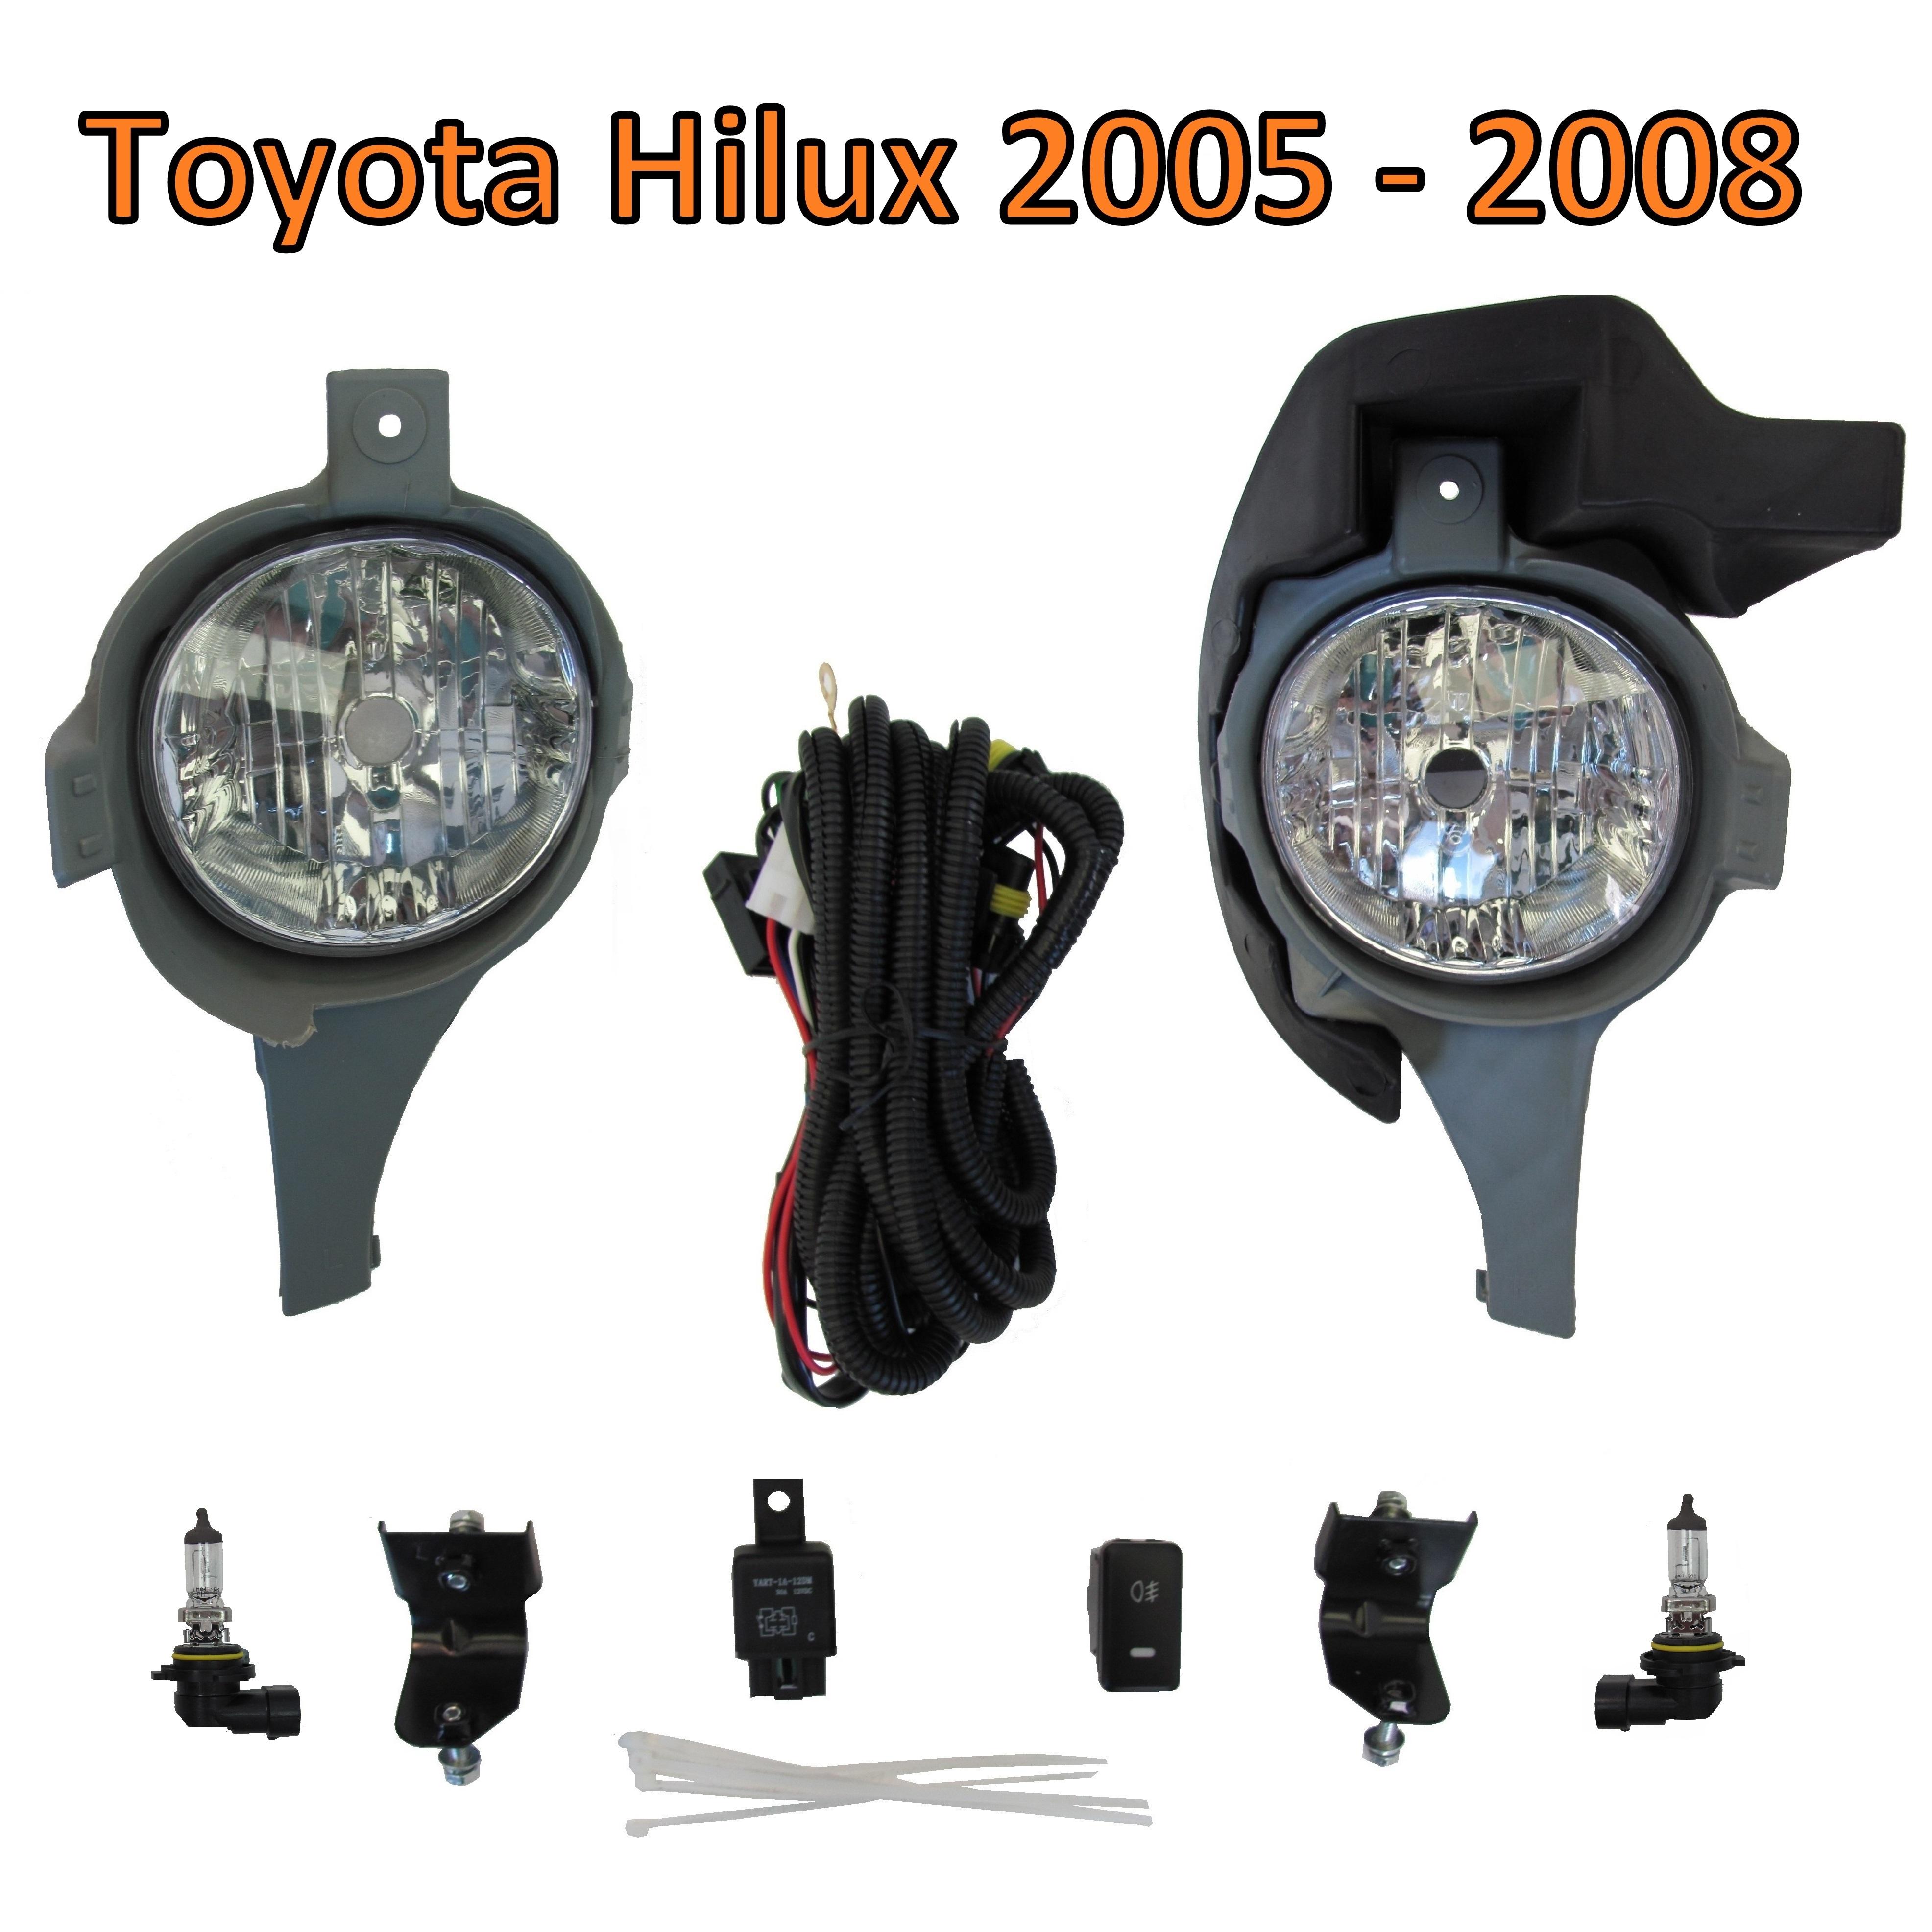 Spot Light Wiring Loom Not Lossing Diagram Driving Toyota Hilux Front Bumper Fog Lamp Kit For Mk6 2005 Uk